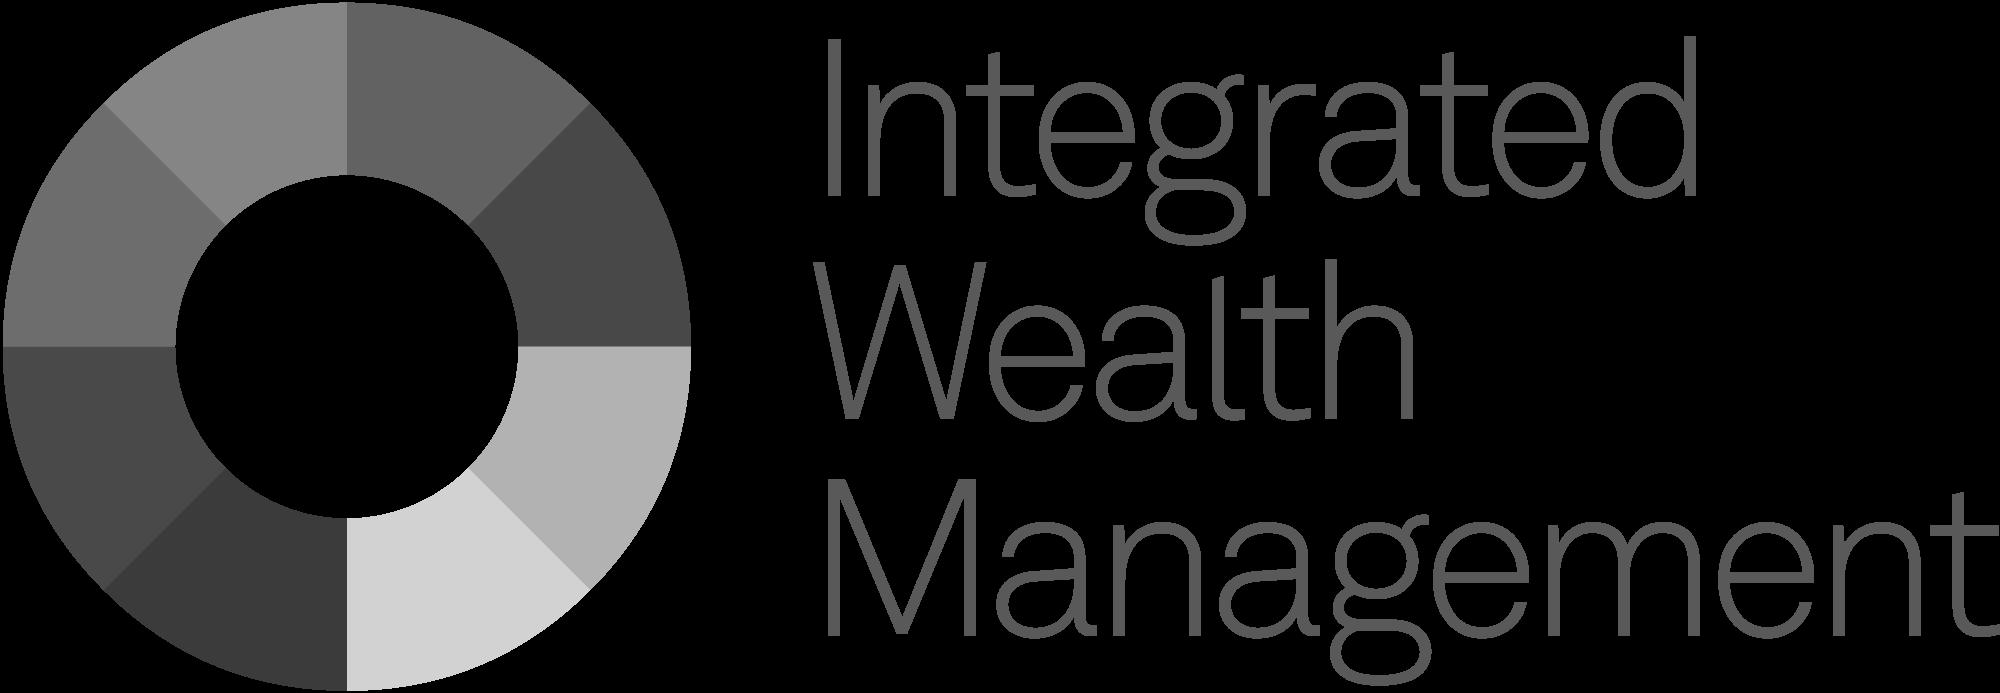 IWM-Logo-LeftAlign-bw